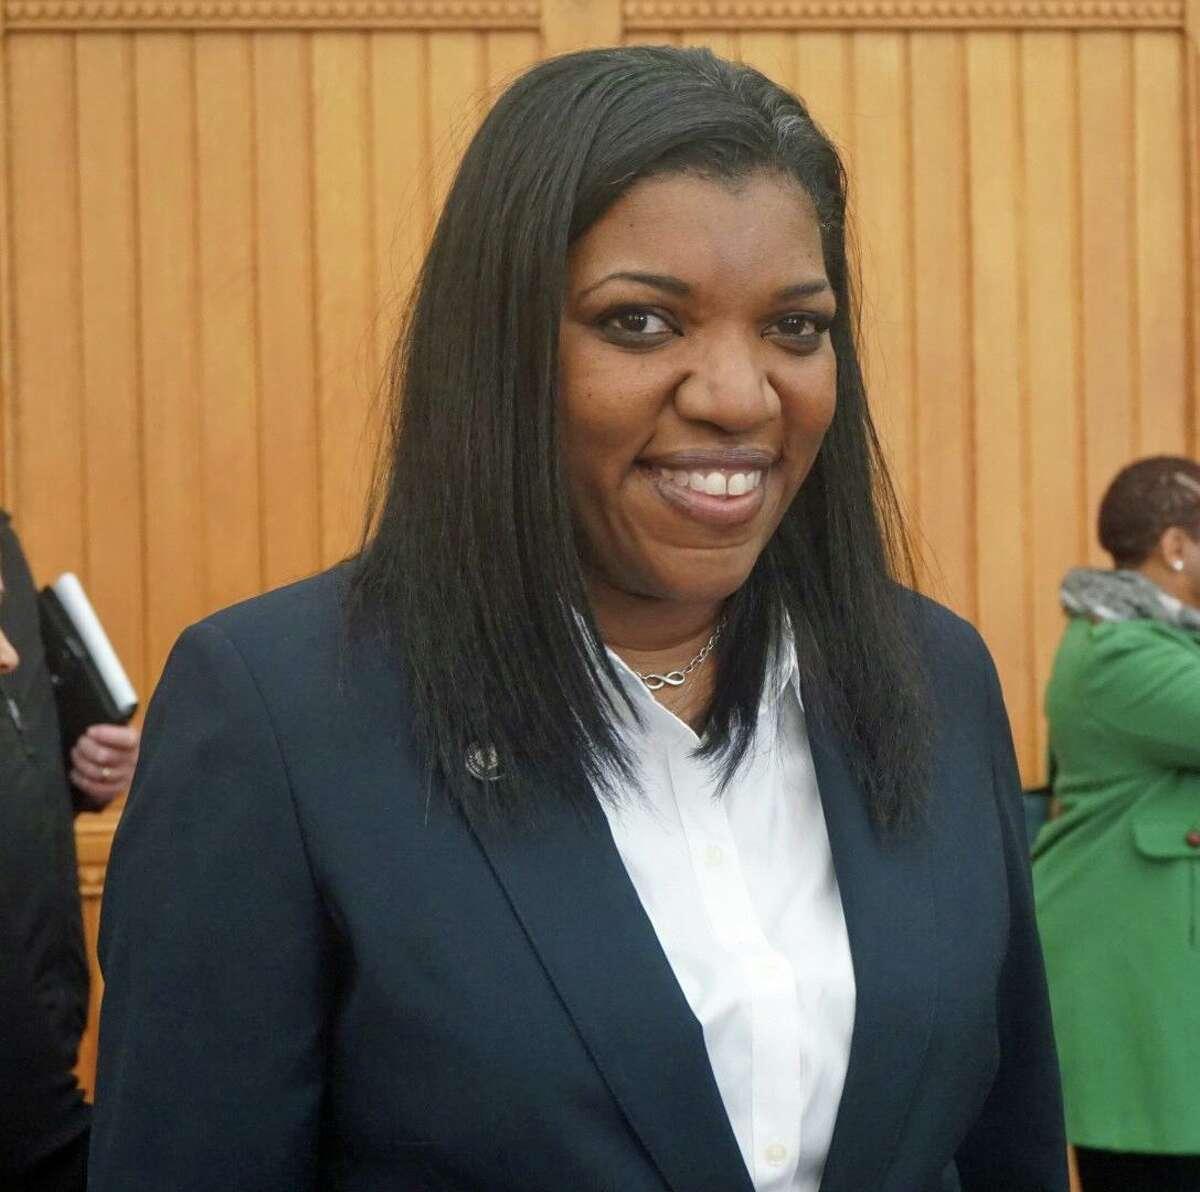 Vannessa Dorantes, commissioner of the Department of Children and Families